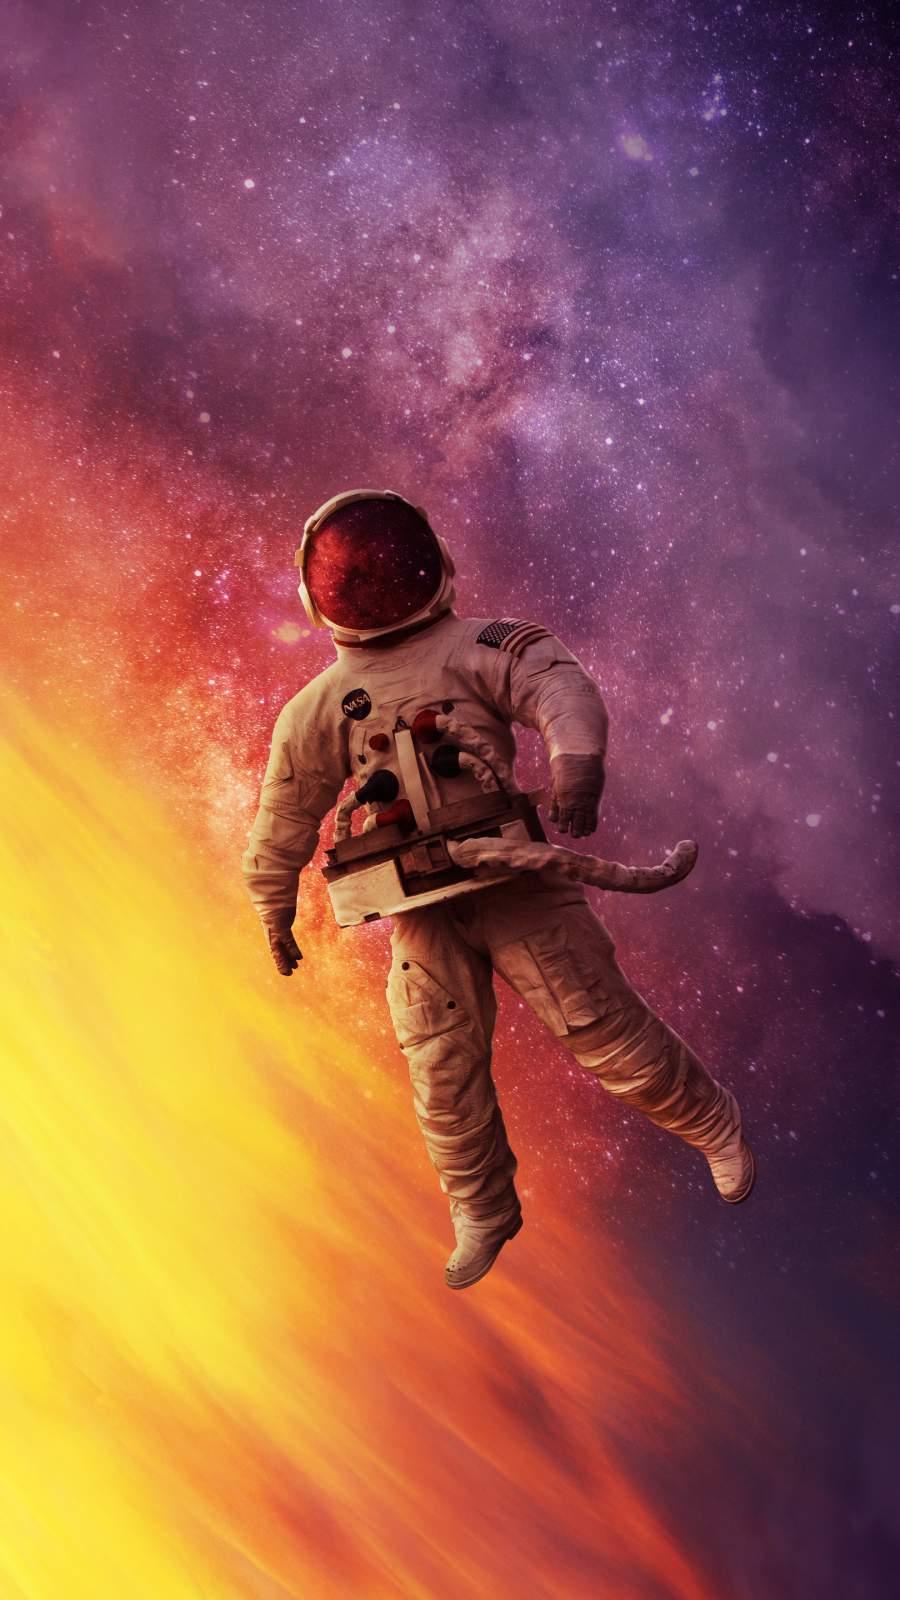 Astronaut Stranded iPhone Wallpaper